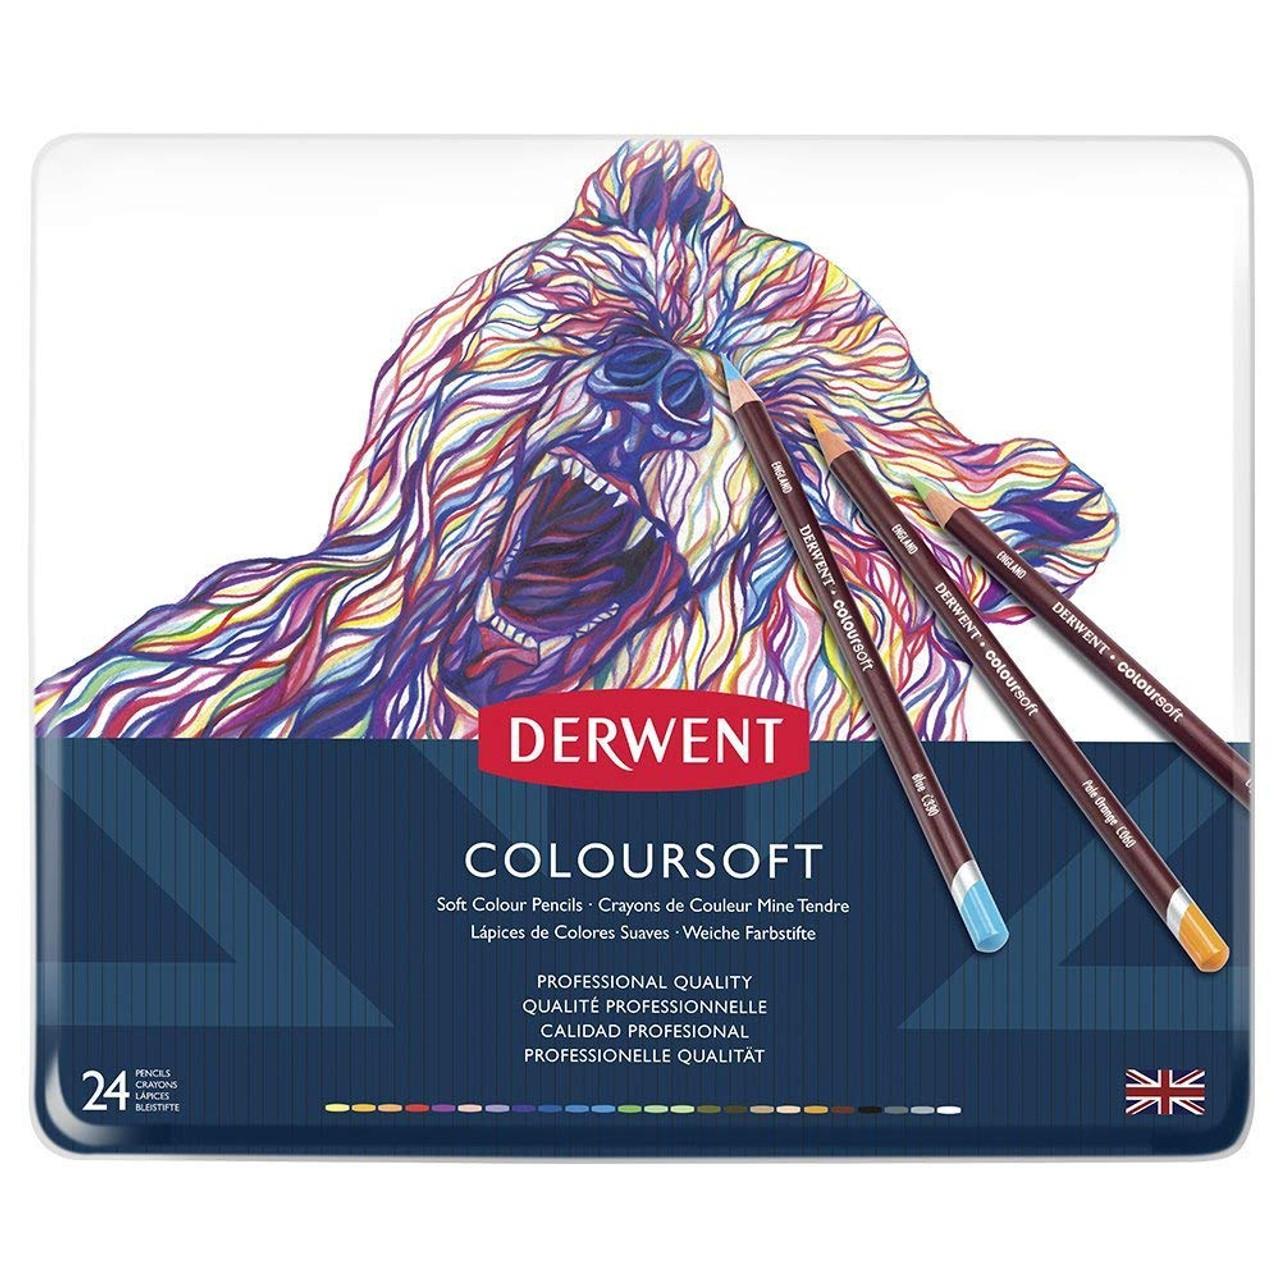 Derwent Coloursoft 24pencil Tin